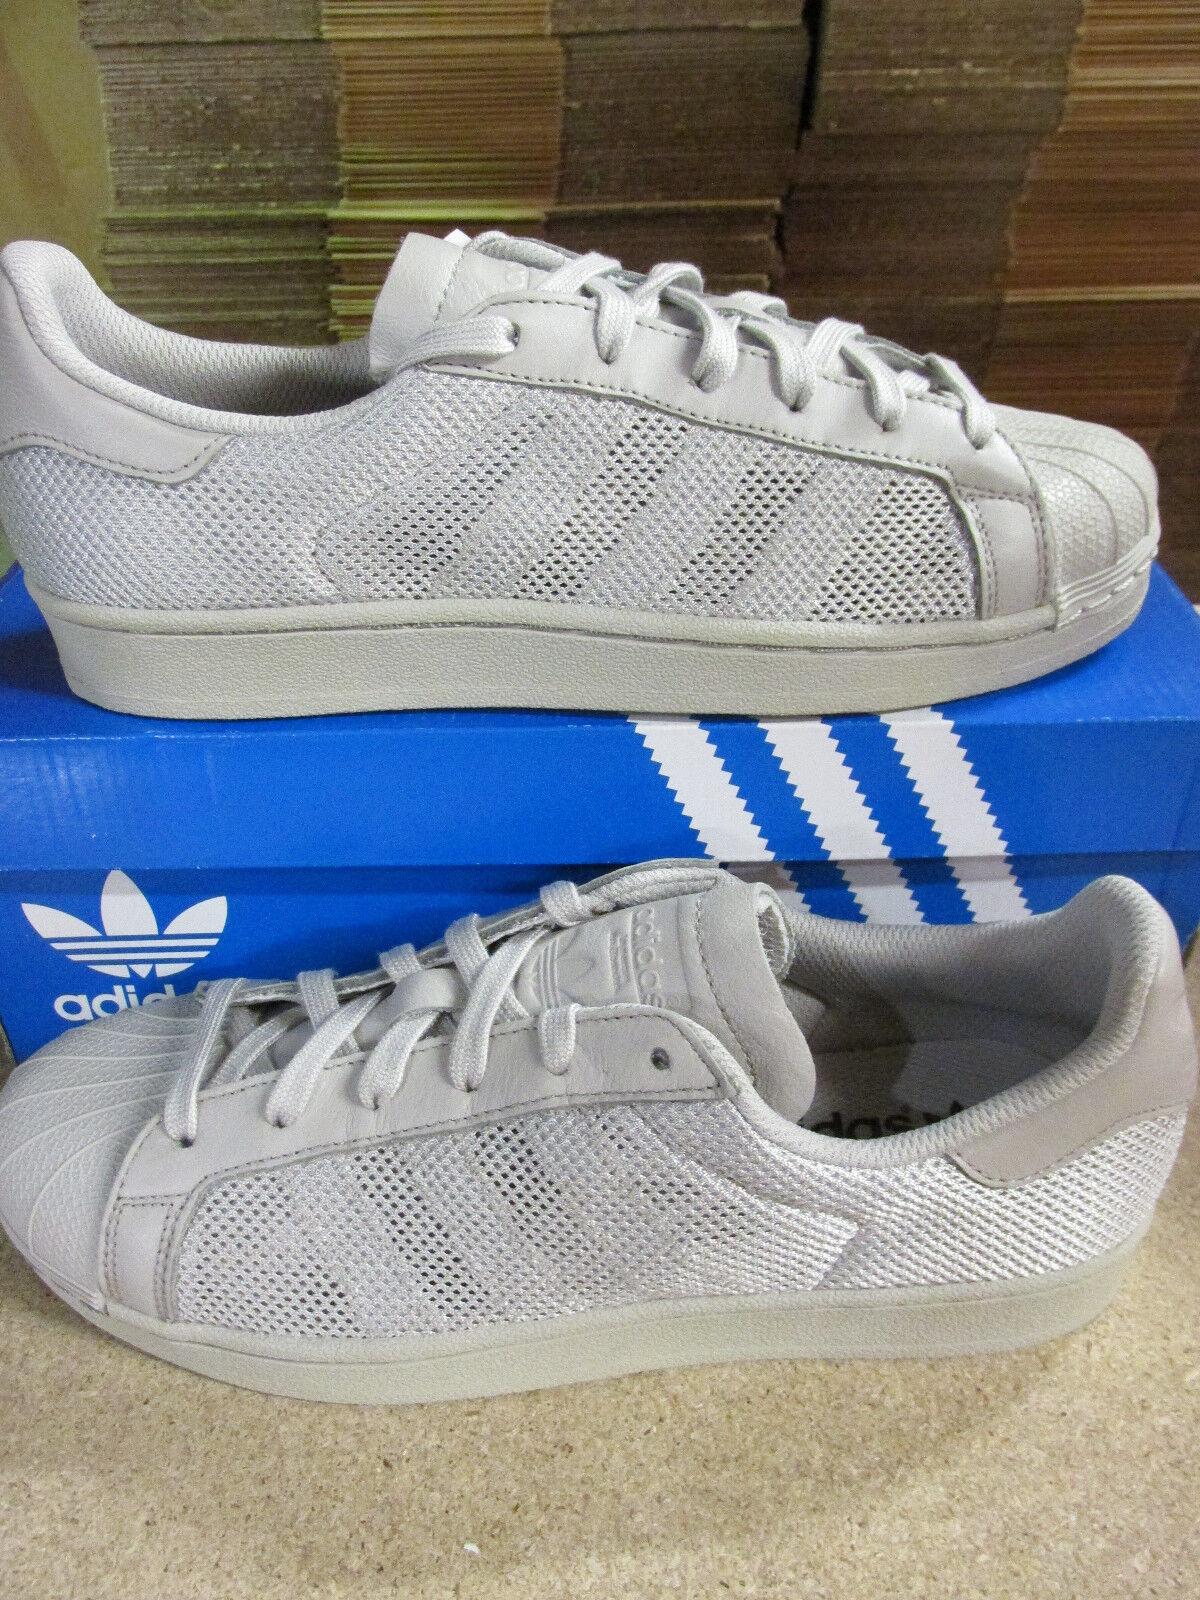 ADIDAS Originals Superstar TRIPLE scarpe da ginnastica Uomo bb3696 bb3696 bb3696 Scarpe Da Ginnastica Scarpe 1484ad